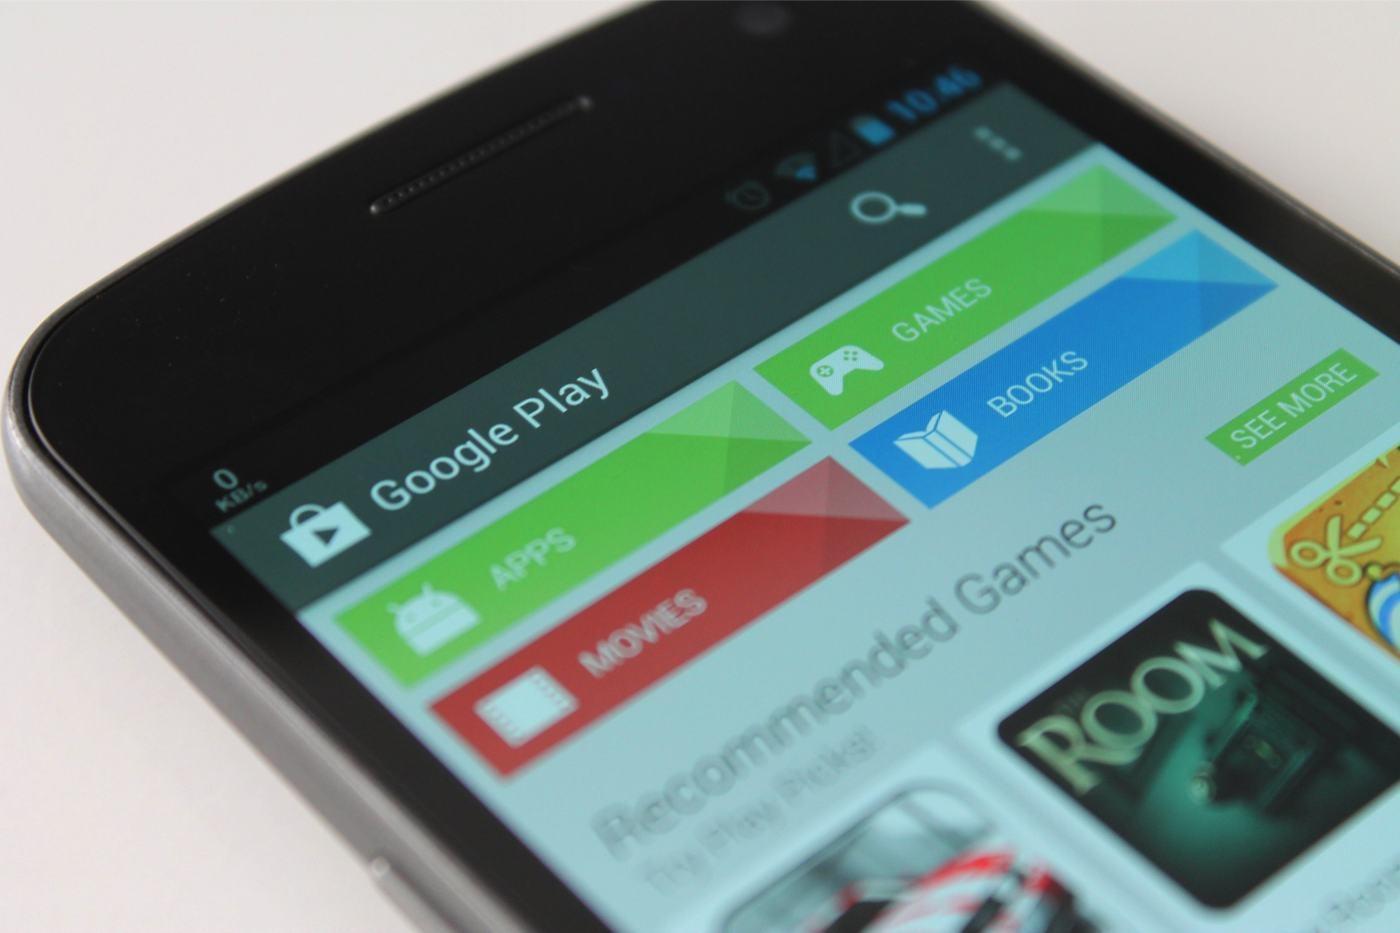 Малварь GhostClicker проникла 340 приложений из каталога Google Play